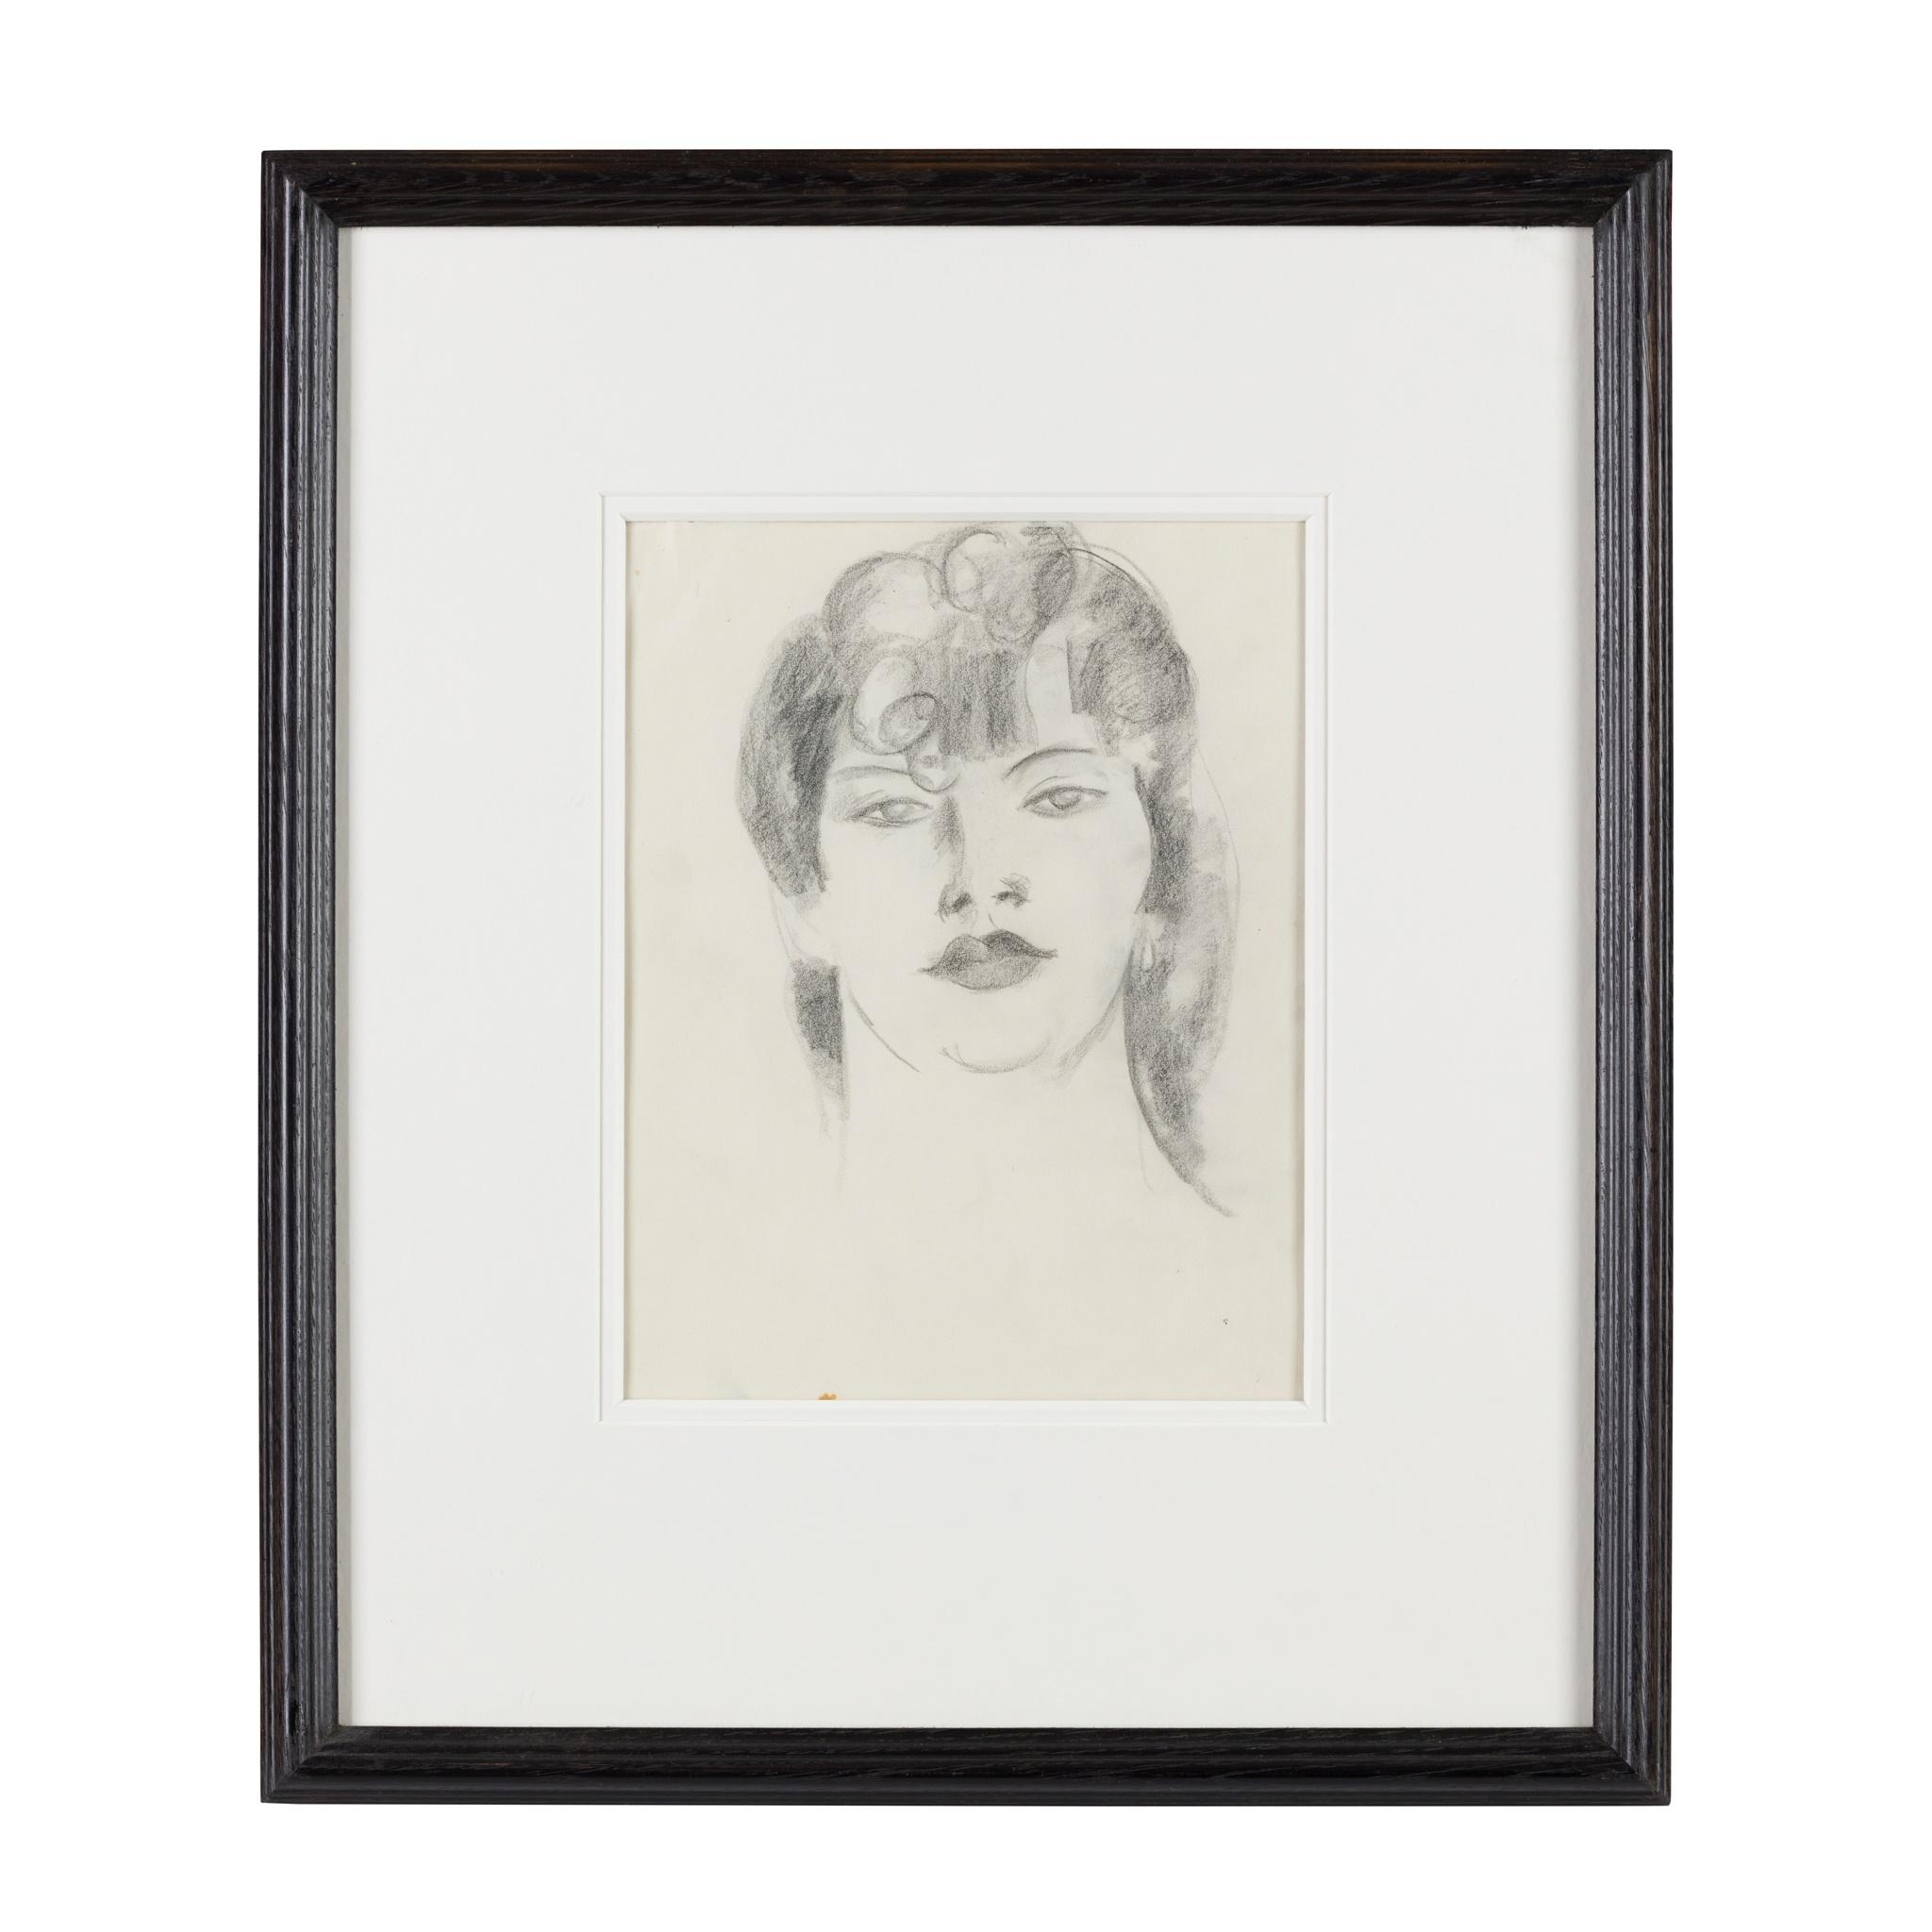 § JOHN DUNCAN FERGUSSON R.B.A. (SCOTTISH 1874-1961) PORTRAIT HEAD - Image 2 of 3